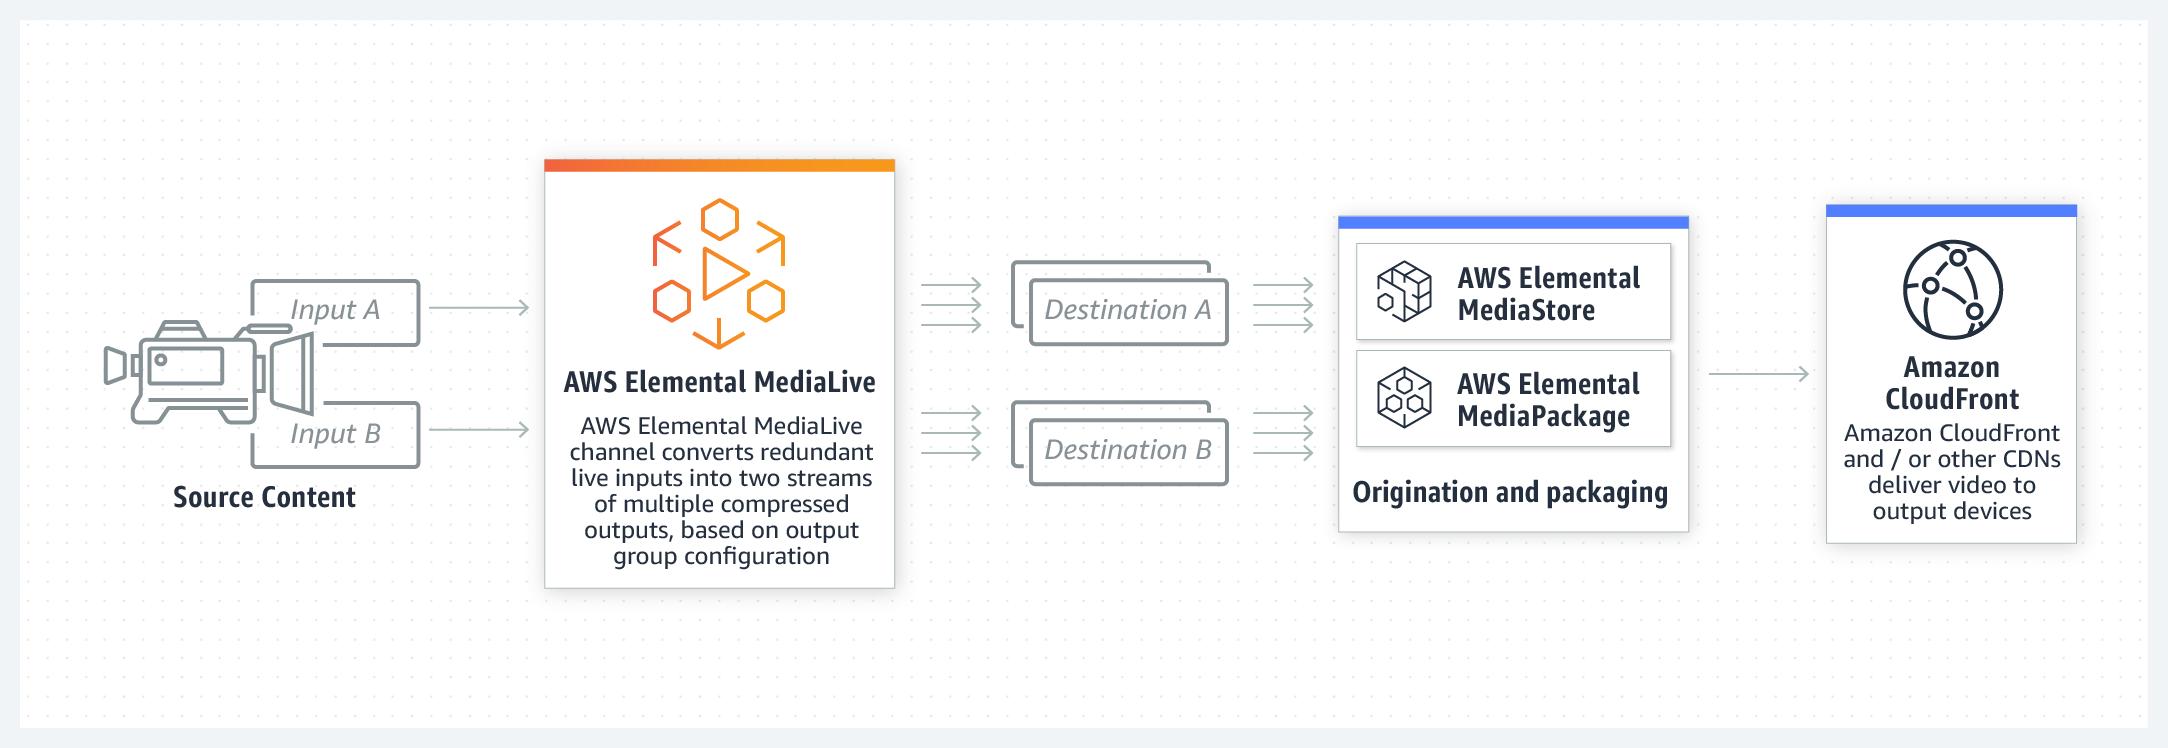 product-page-diagram-Elemental-MediaLive@2x.2570dba1da7763ff116d3dc2897e772ff238b63e.png